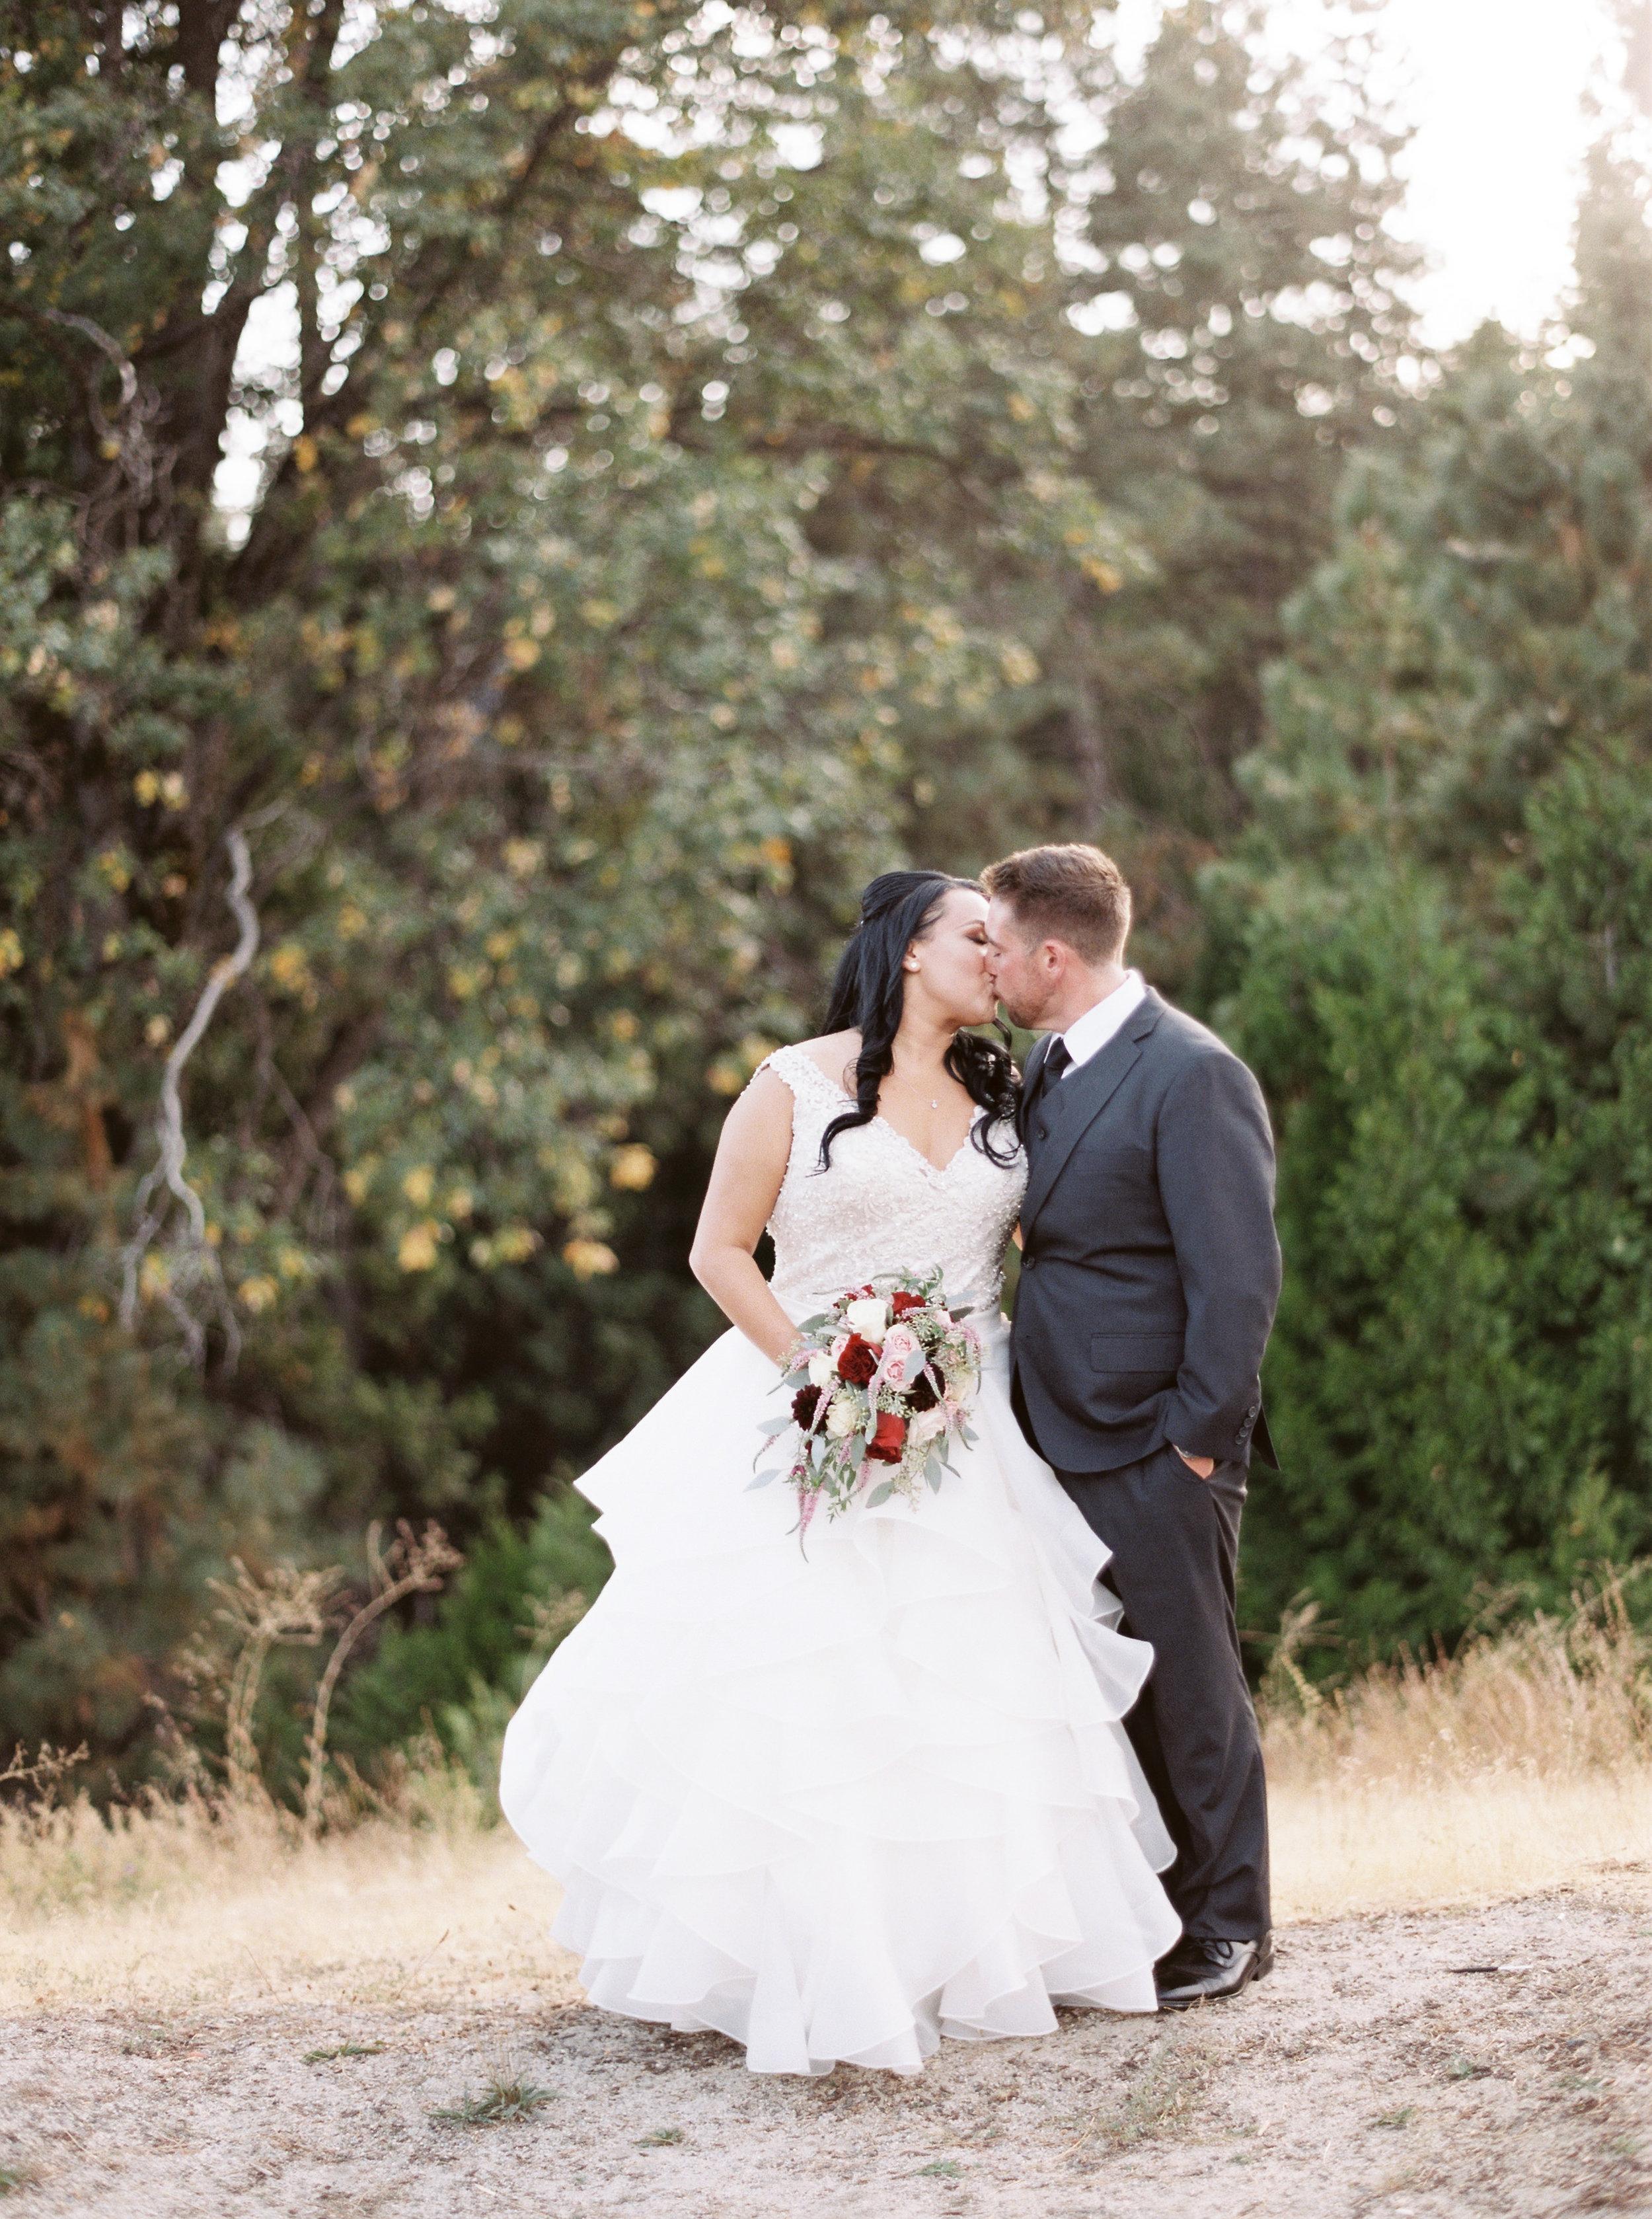 Tenaya-lodge-wedding-at-yosemite-national-park-california-54.jpg